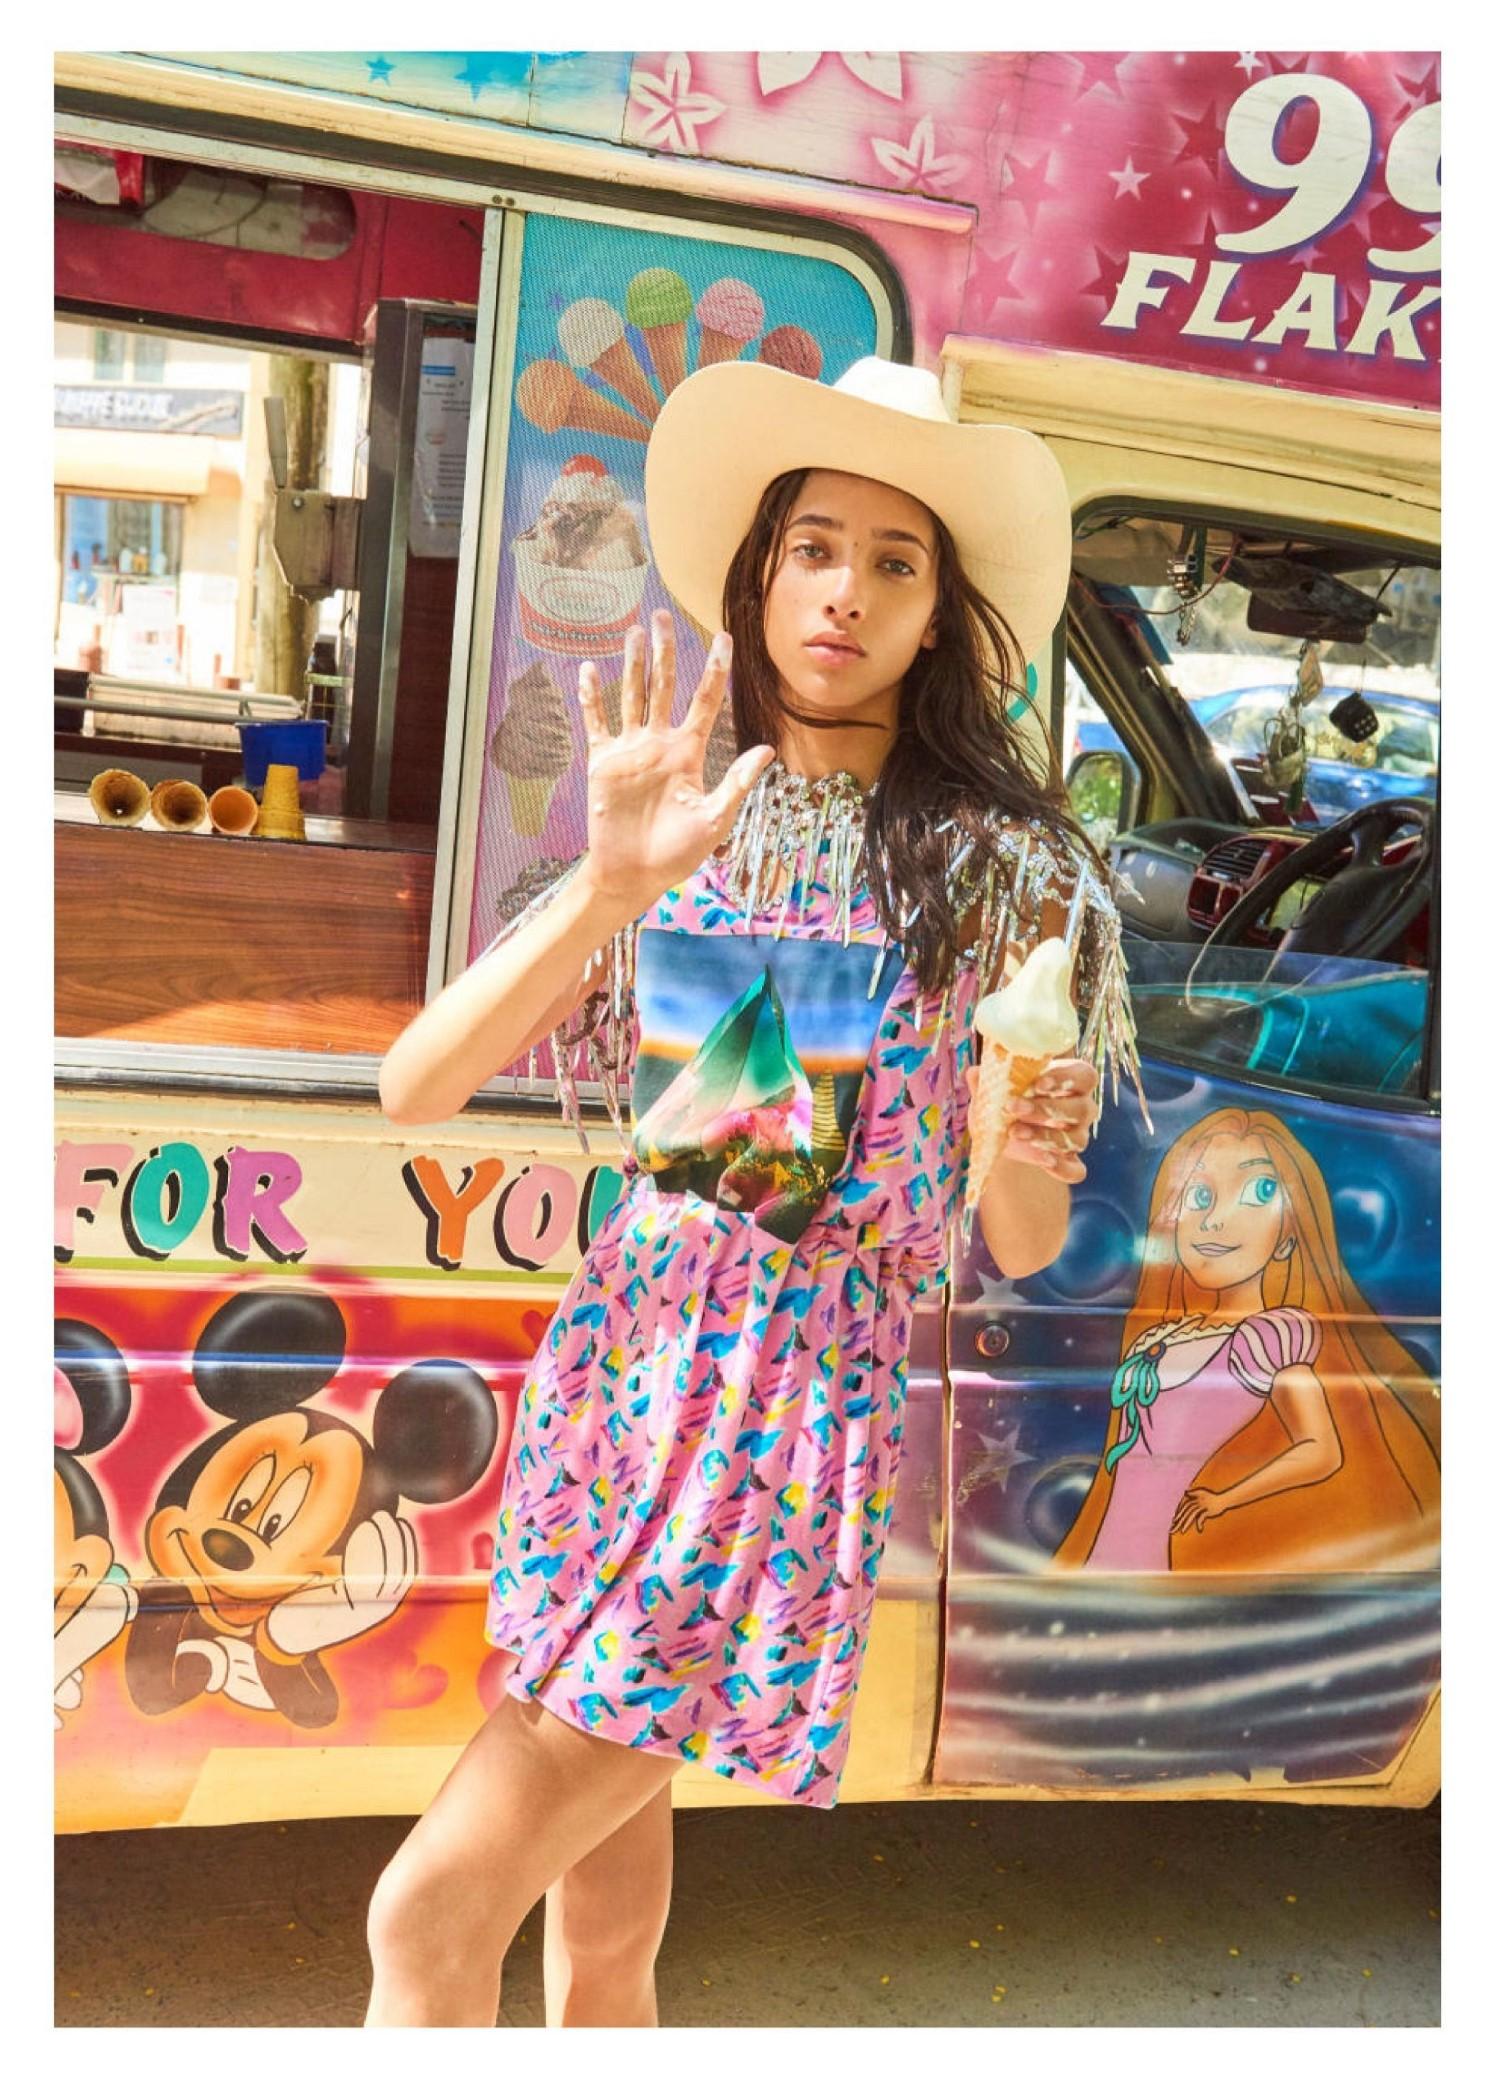 Yasmin Wijnaldum Tung Walsh Vogue Netherlands June 2019 (16).jpg